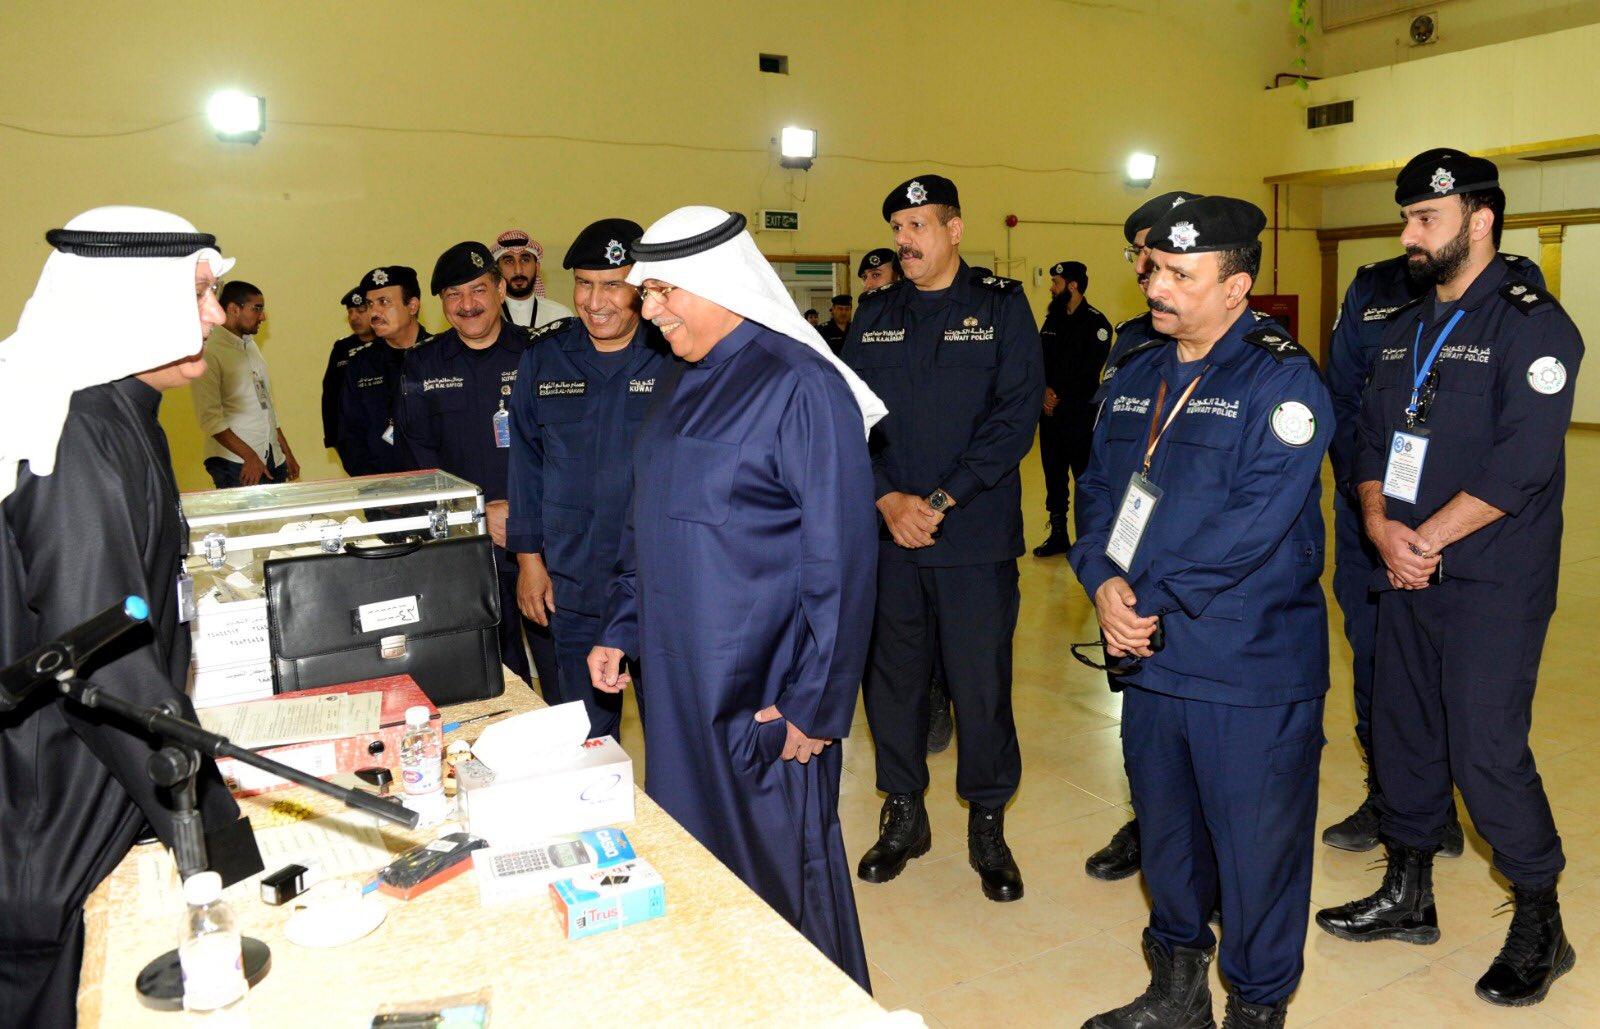 IMG ٢٠١٩٠٣١٦ ١٧٣٤٠٠ - الجراح: الكويت تشهد عرسًا ديمقراطيًا يؤكد التلاحم والتآزر بين أبنائها جميعًا